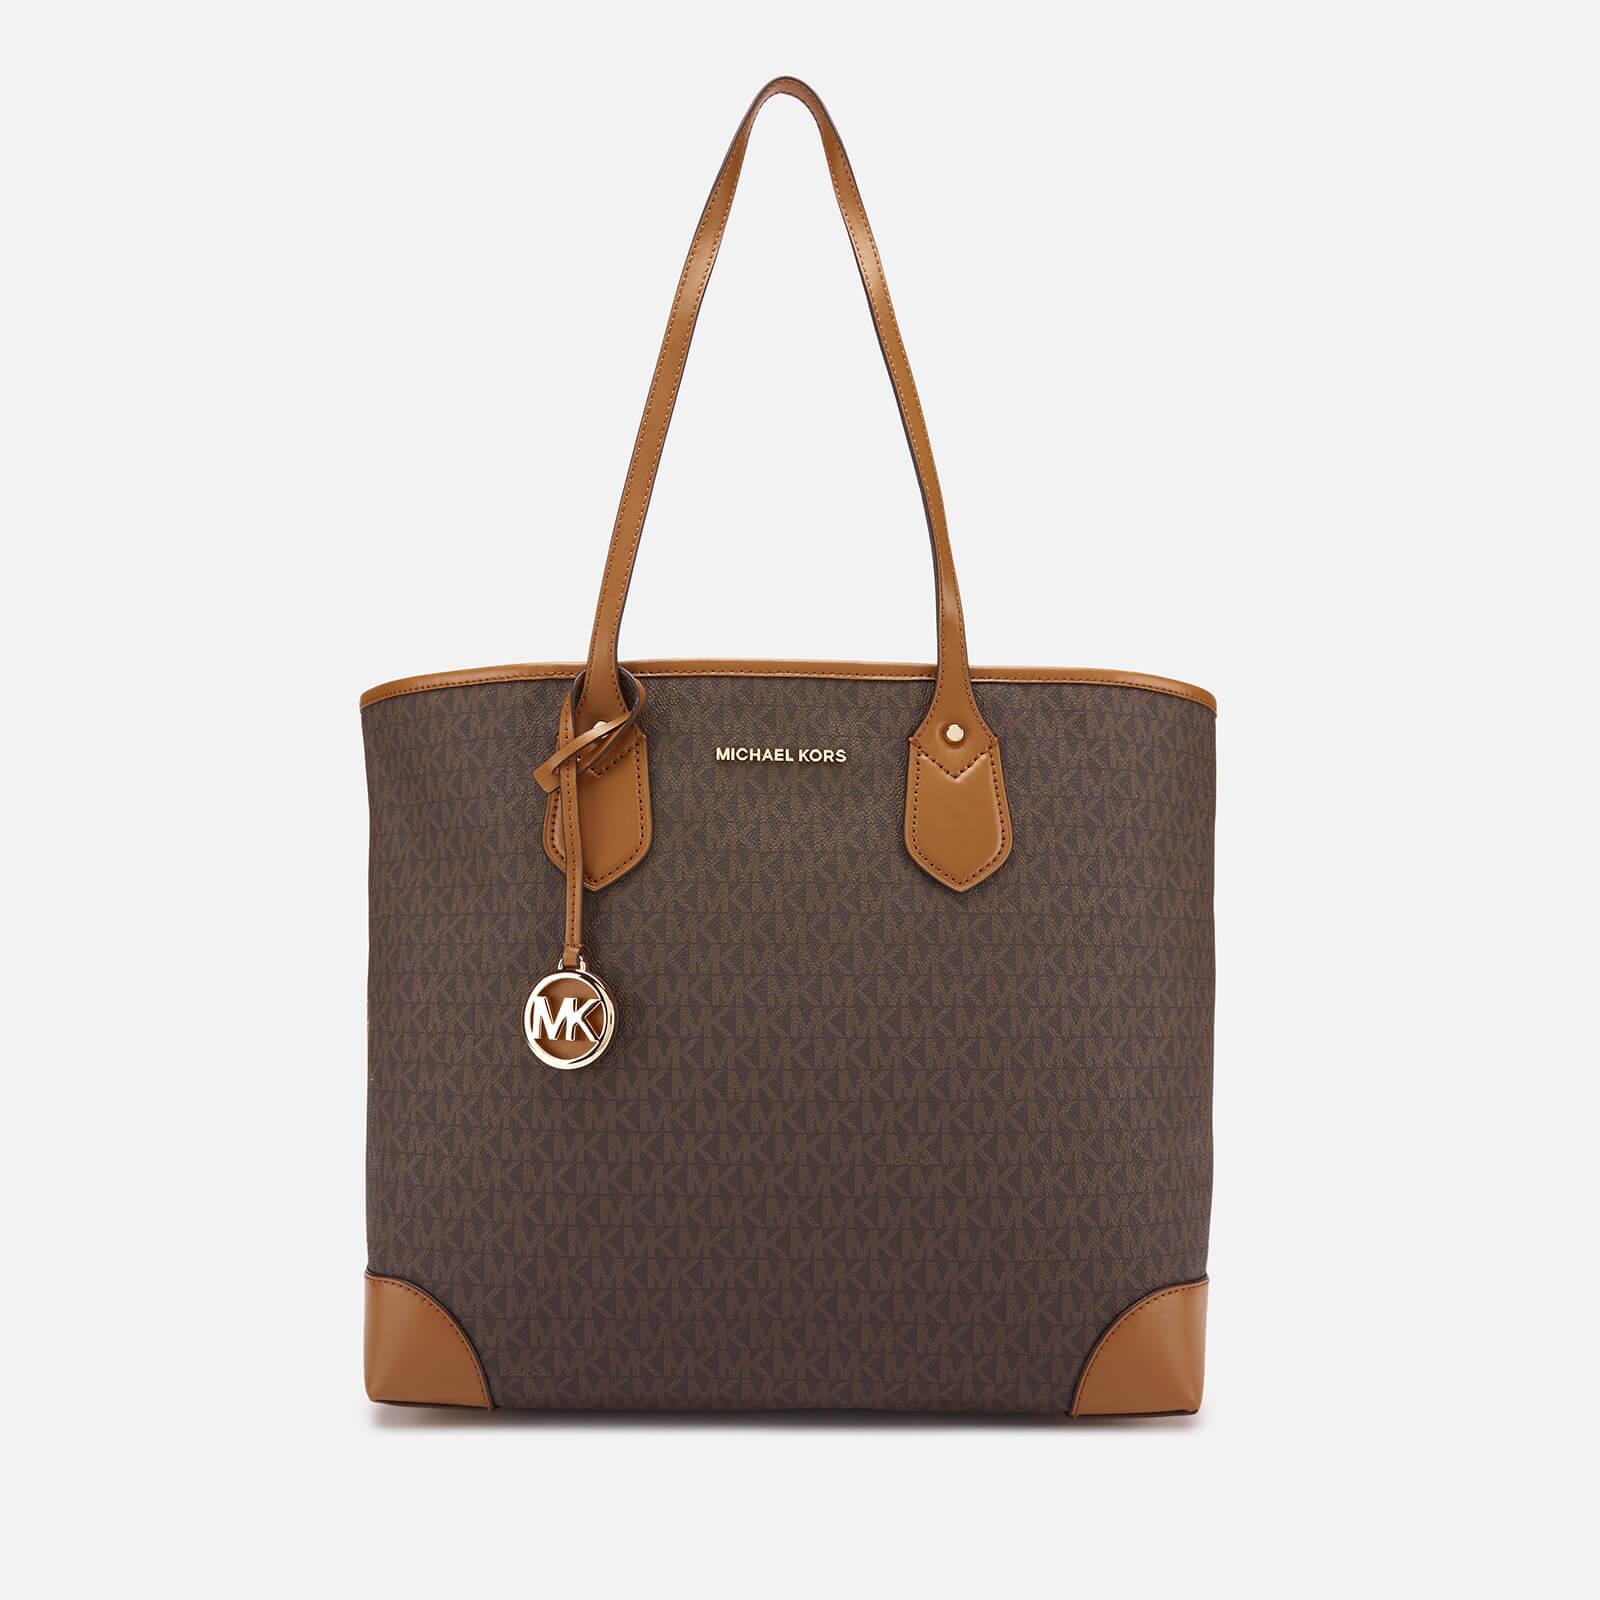 fe3949d5dd359c MICHAEL MICHAEL KORS Women's Eva Large Tote Bag - Brown - Free UK Delivery  over £50